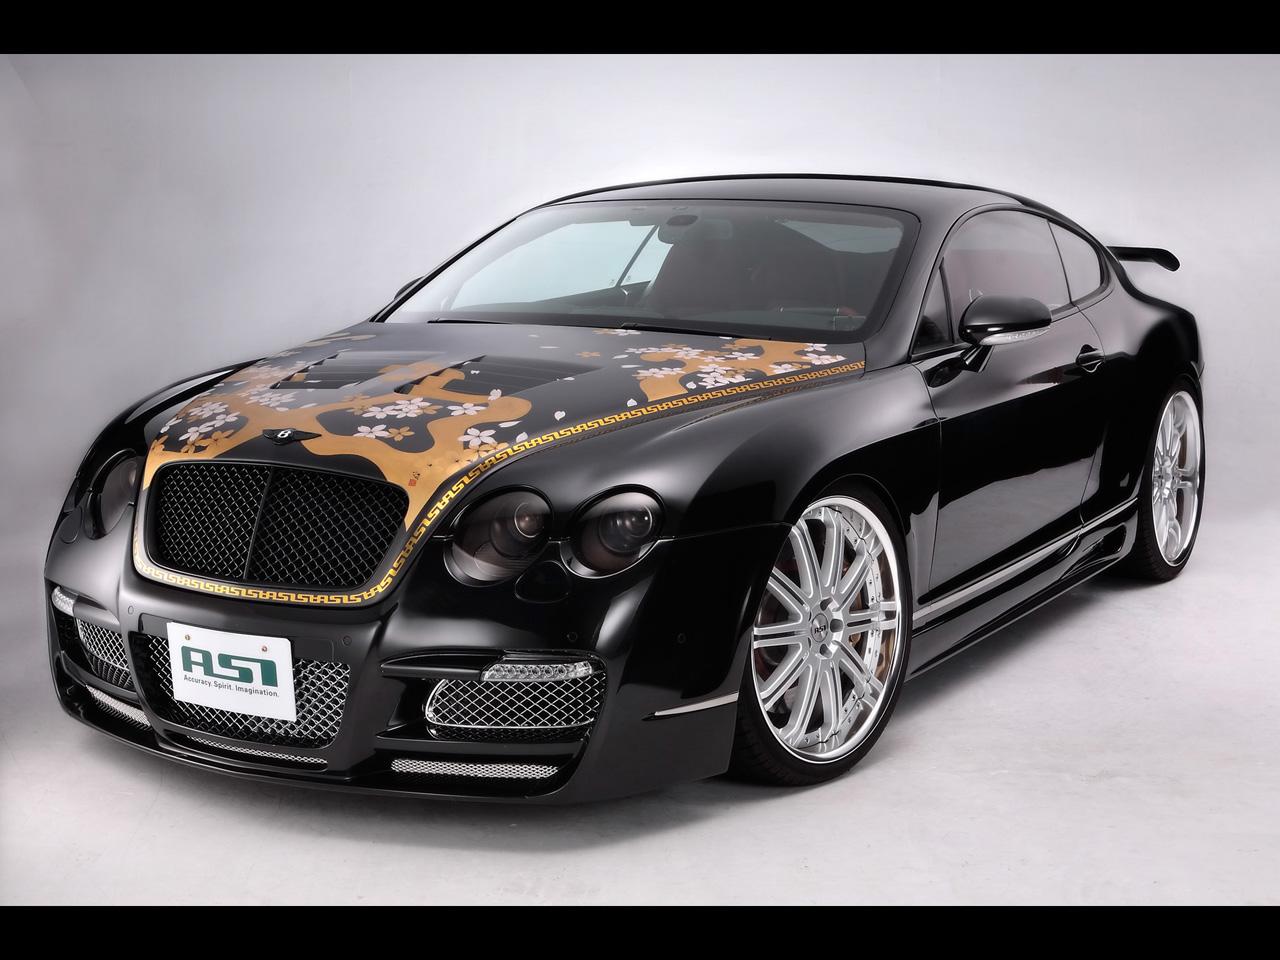 Michael Jordan Wallpaper Hd Wallpaper Backgrounds Bentley Continental Gt Wallpapers